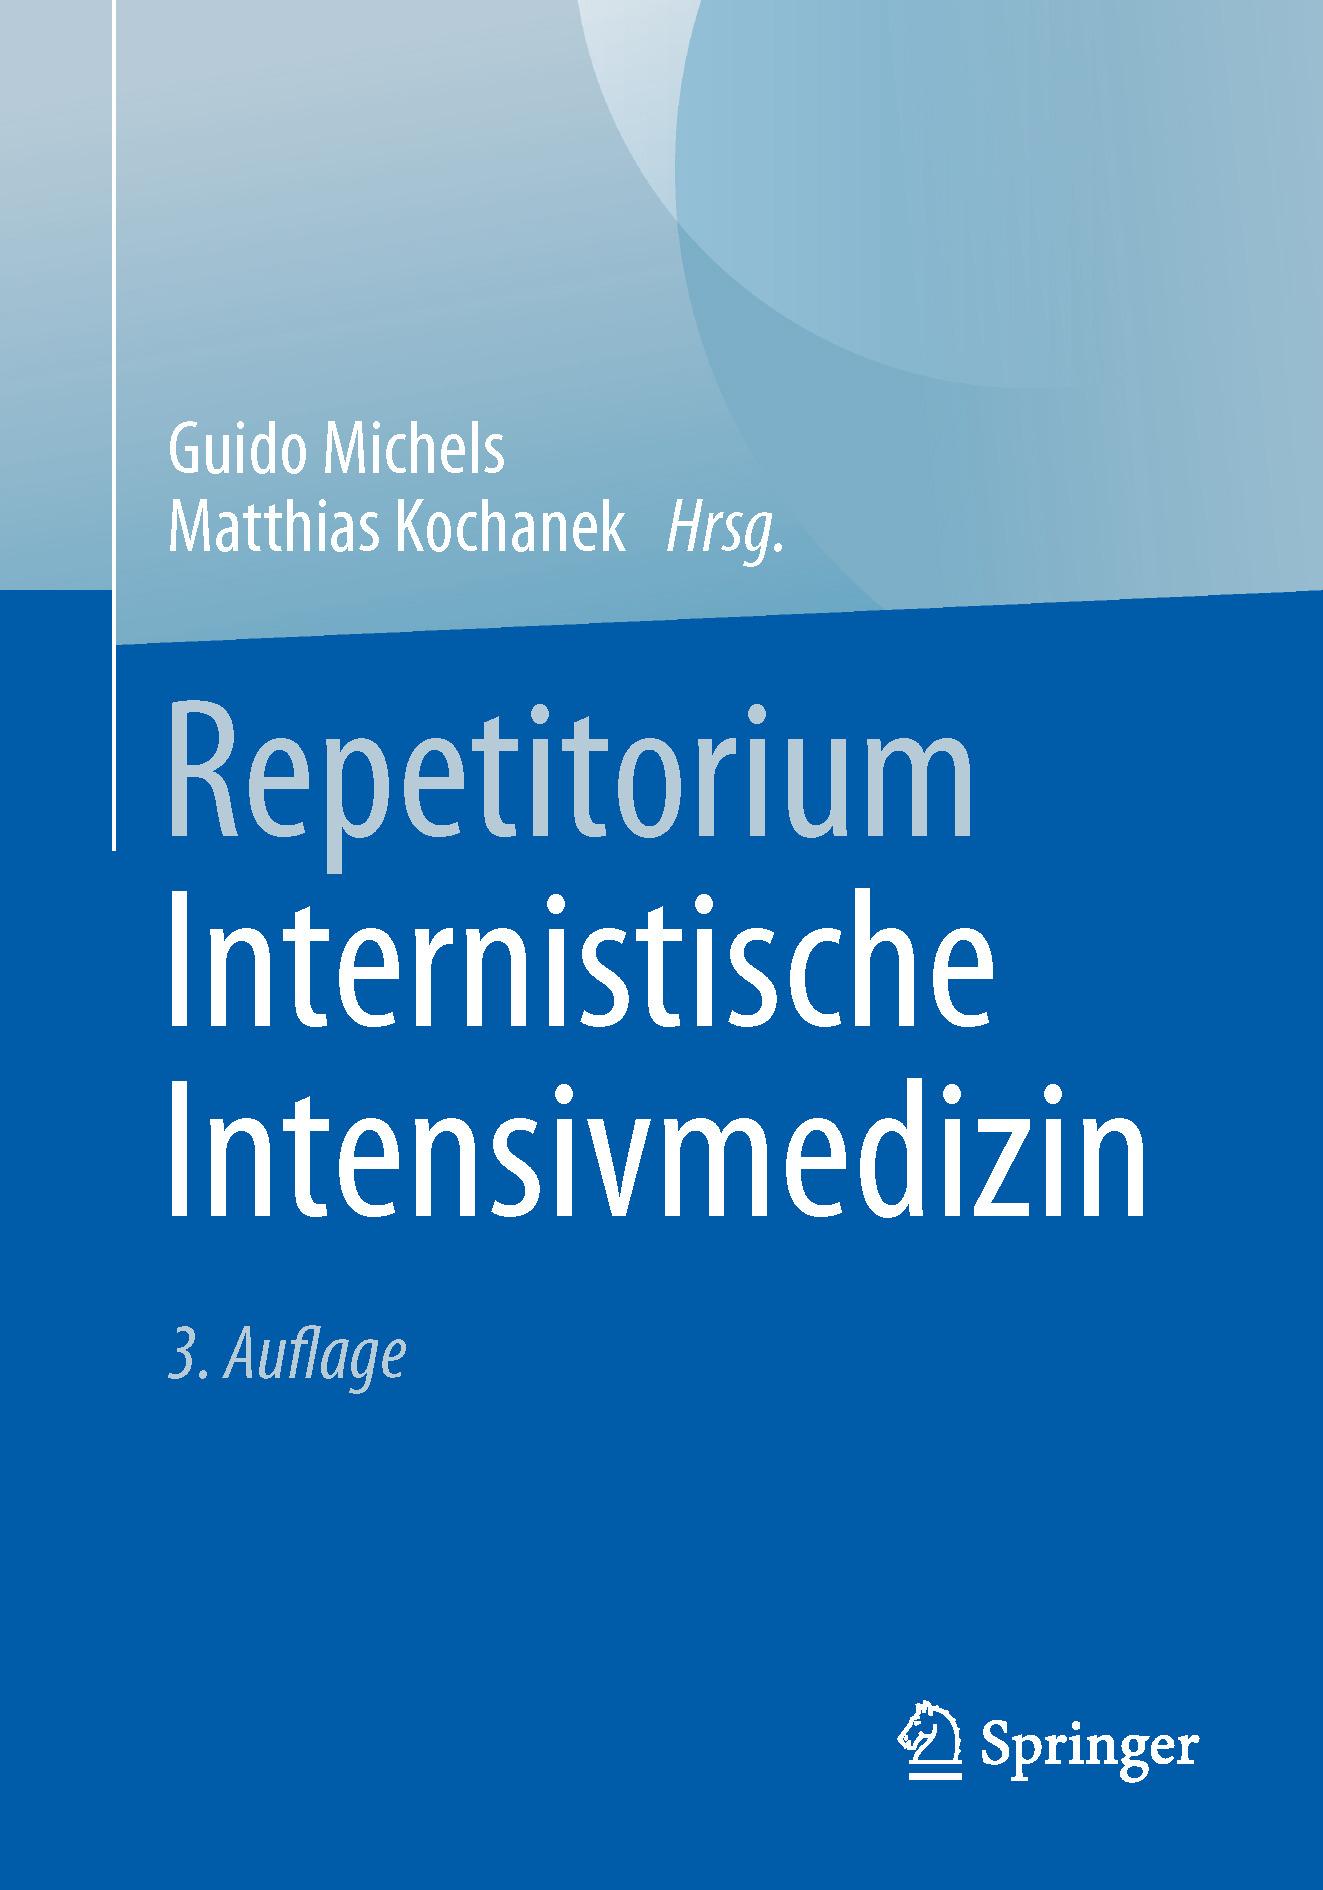 Kochanek, Matthias - Repetitorium Internistische Intensivmedizin, ebook